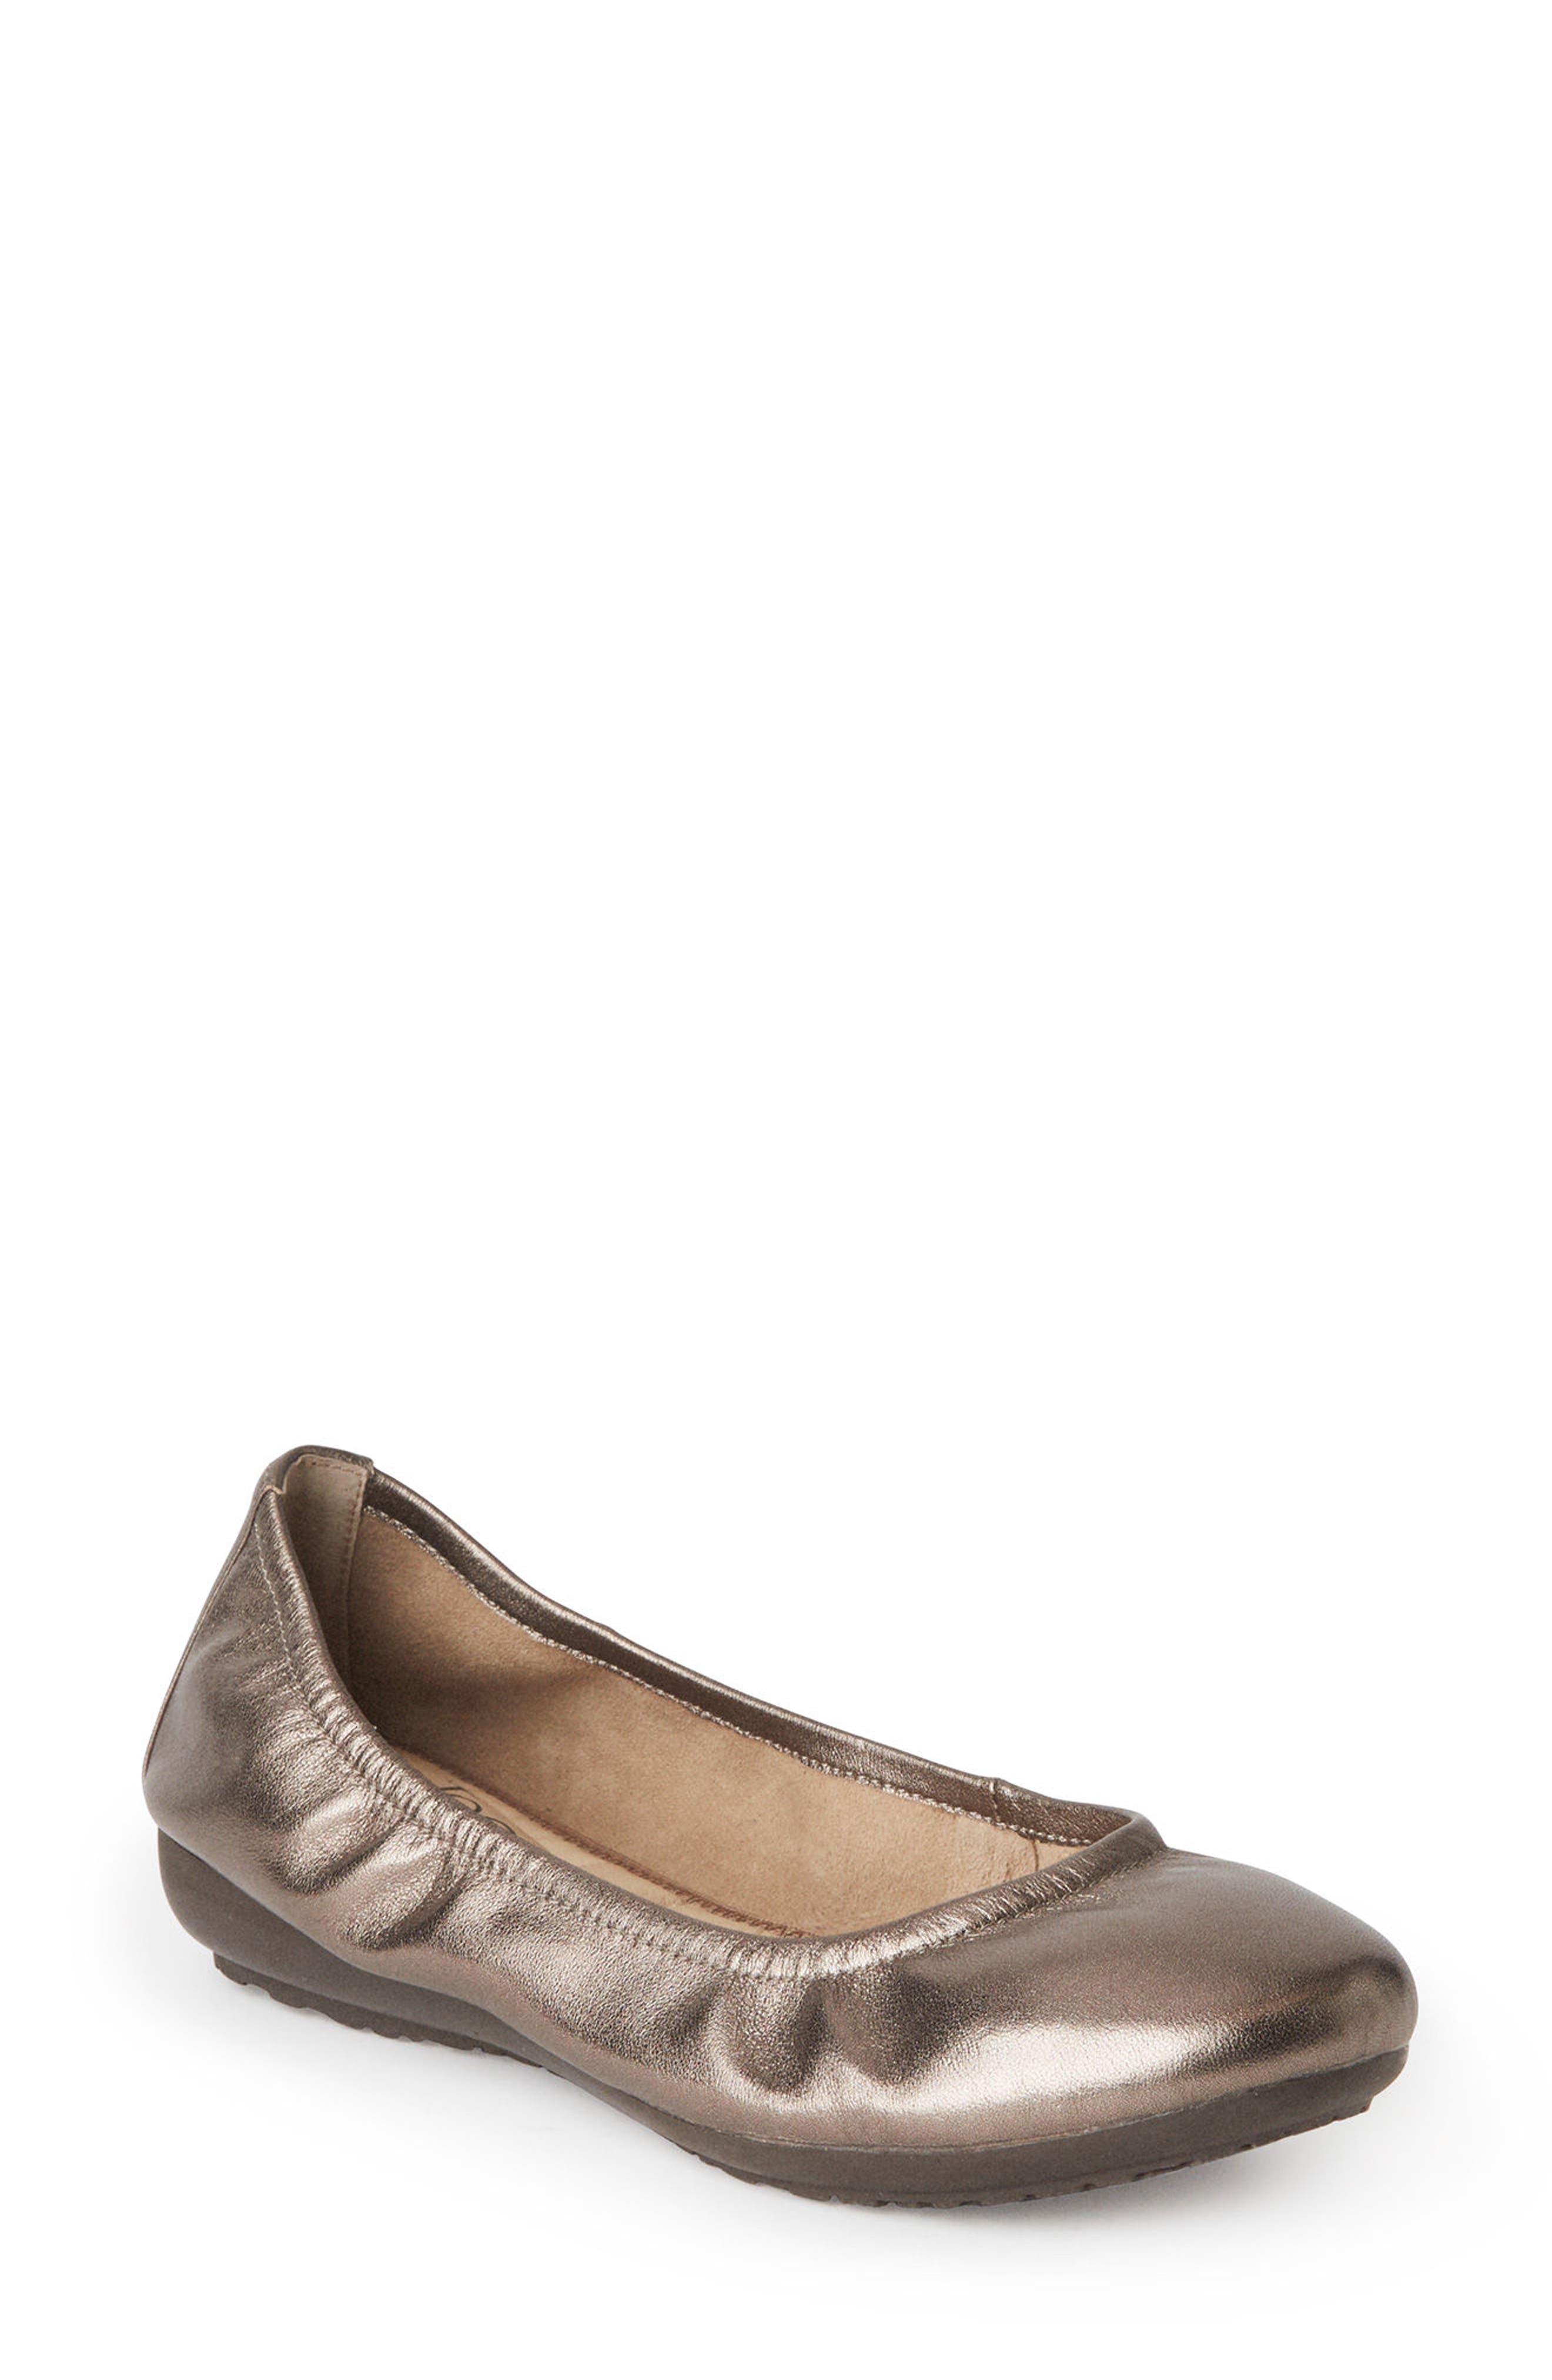 Janell Sliver Wedge Flat,                         Main,                         color, Mink Metallic Leather